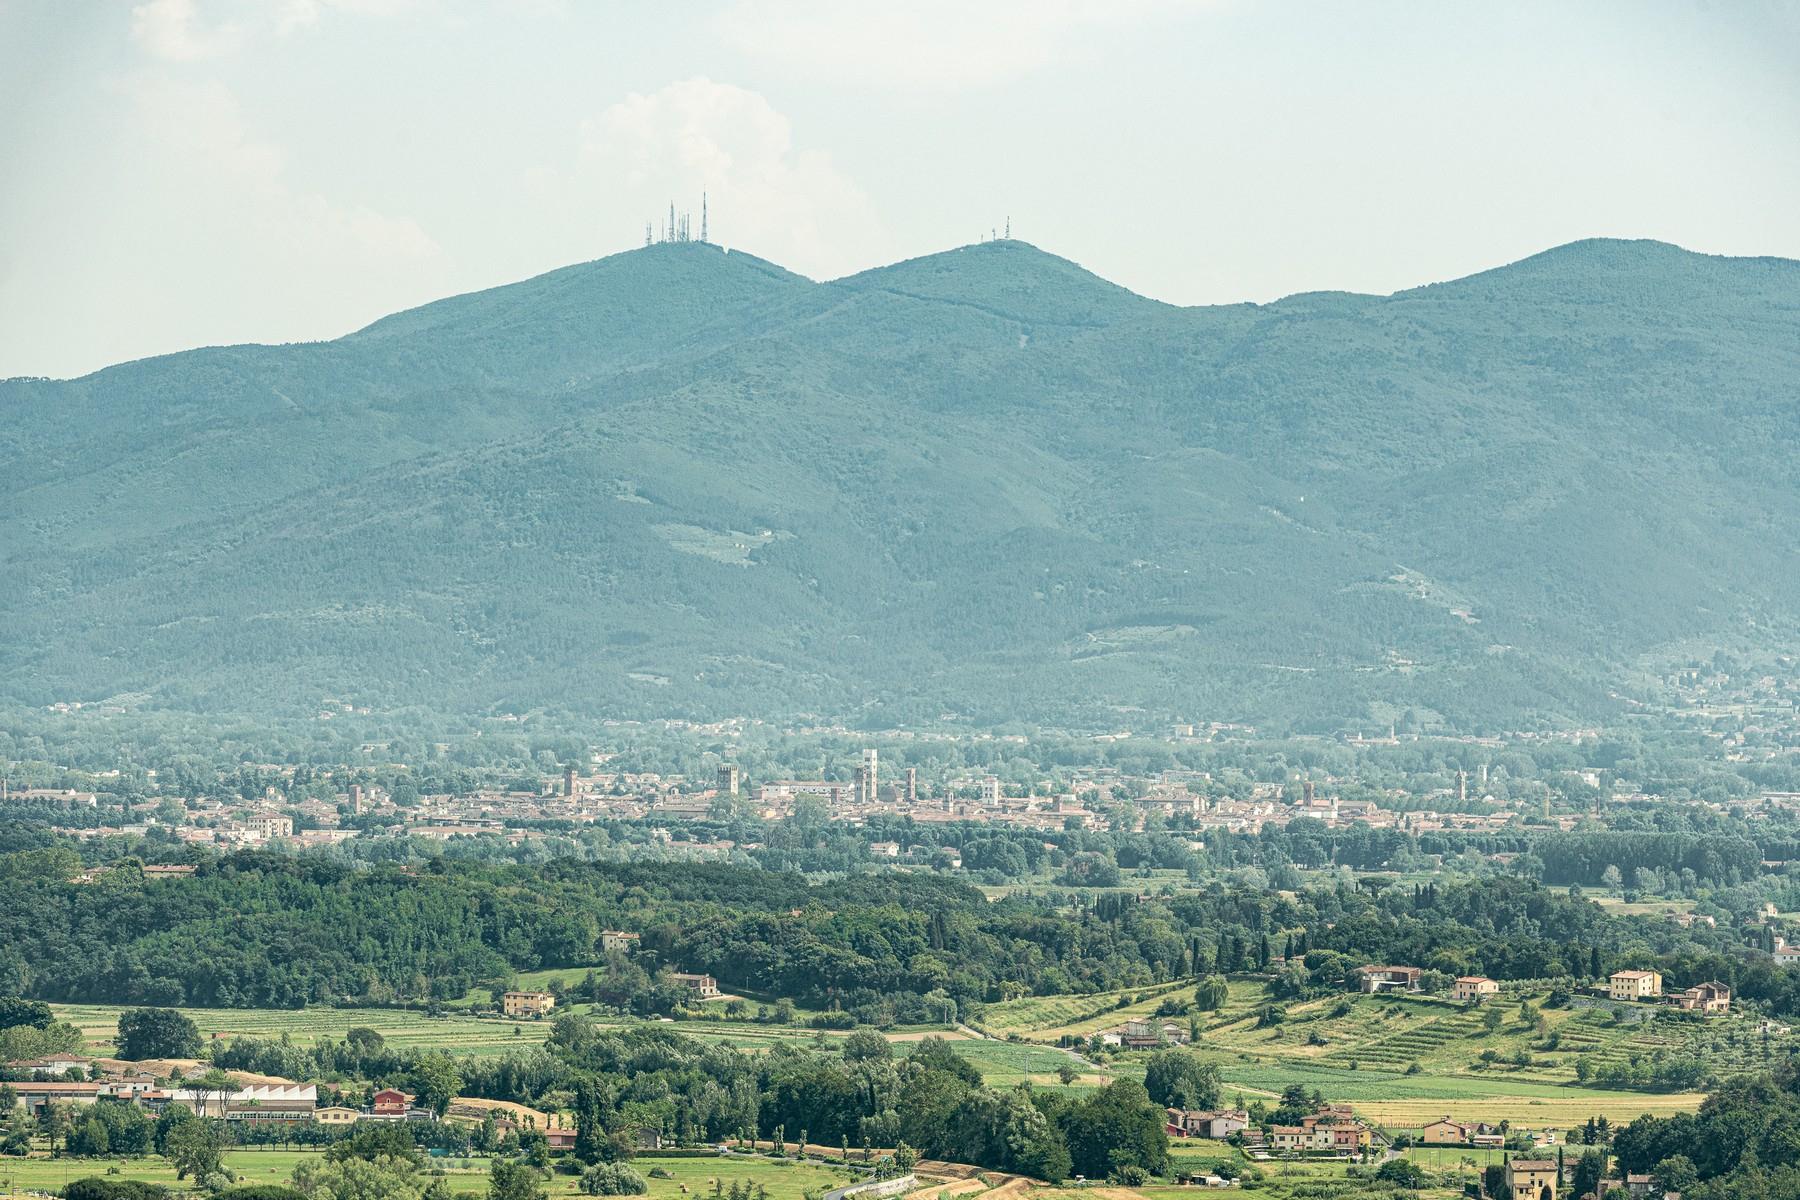 Rustico in Vendita a Lucca: 5 locali, 500 mq - Foto 25